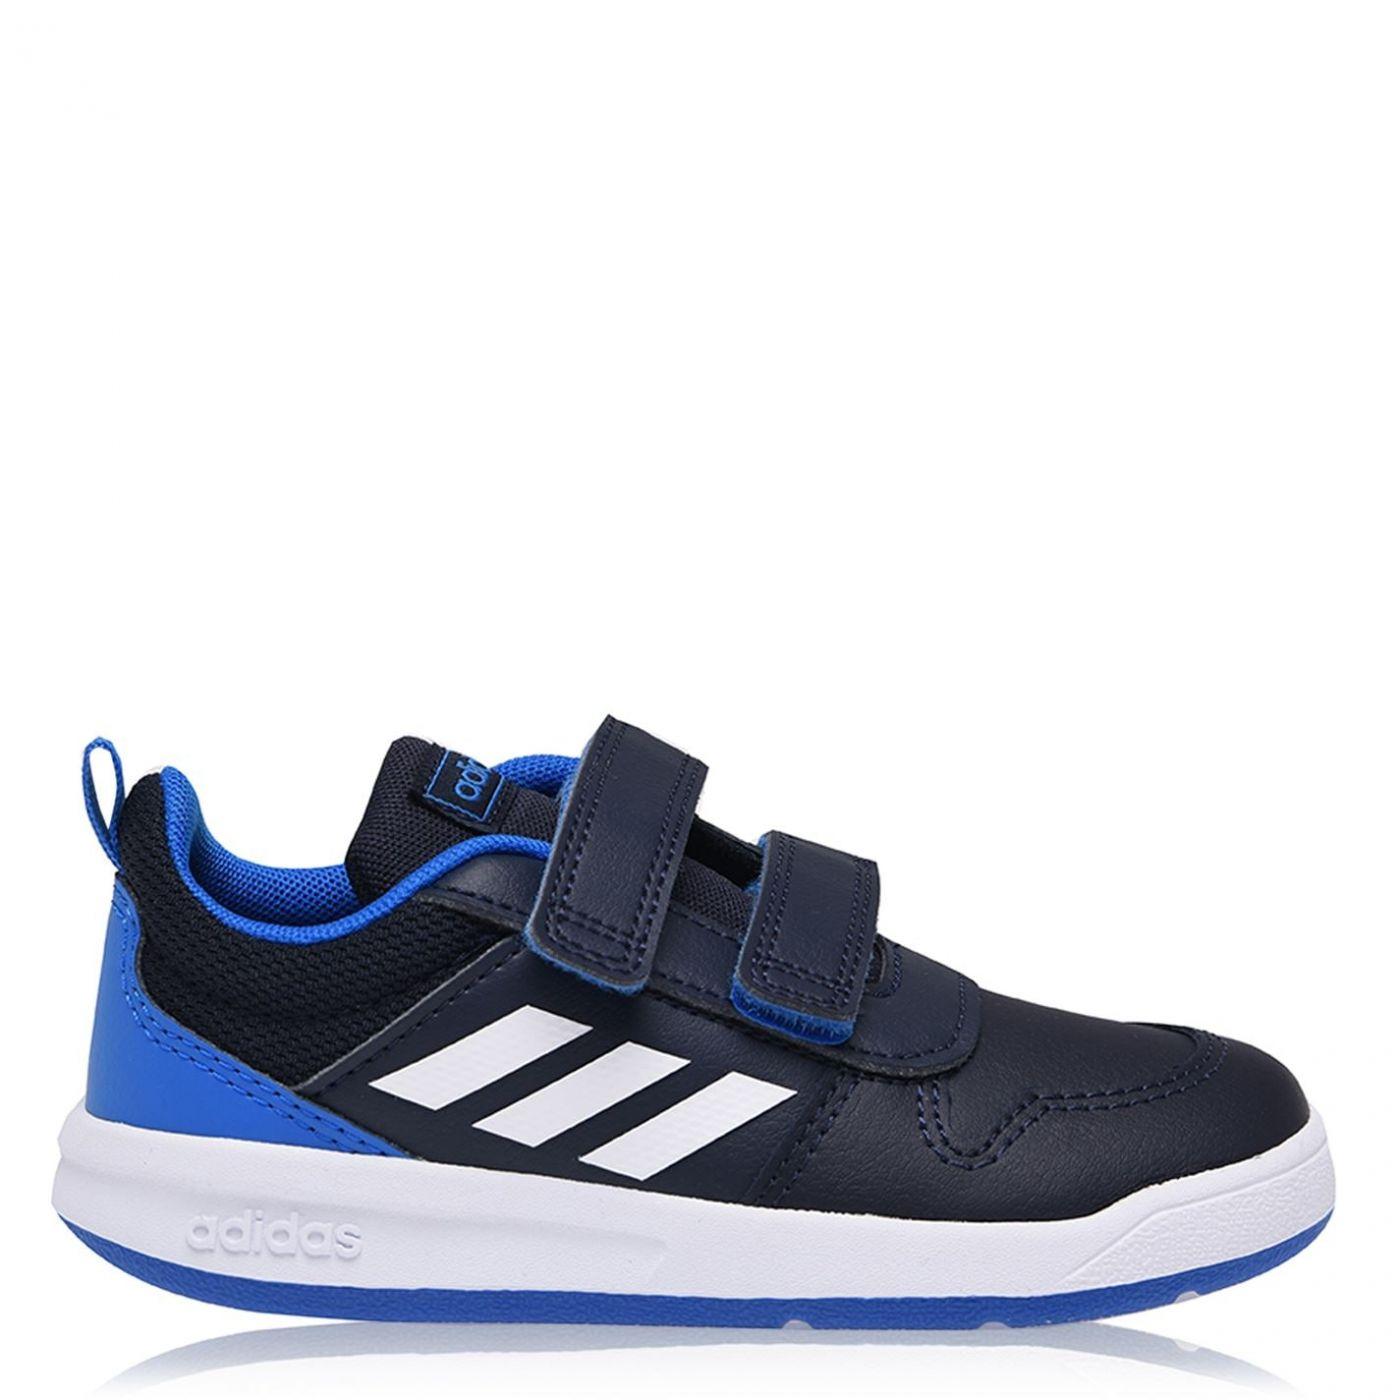 Adidas Tensuar Trainers Infant Boys